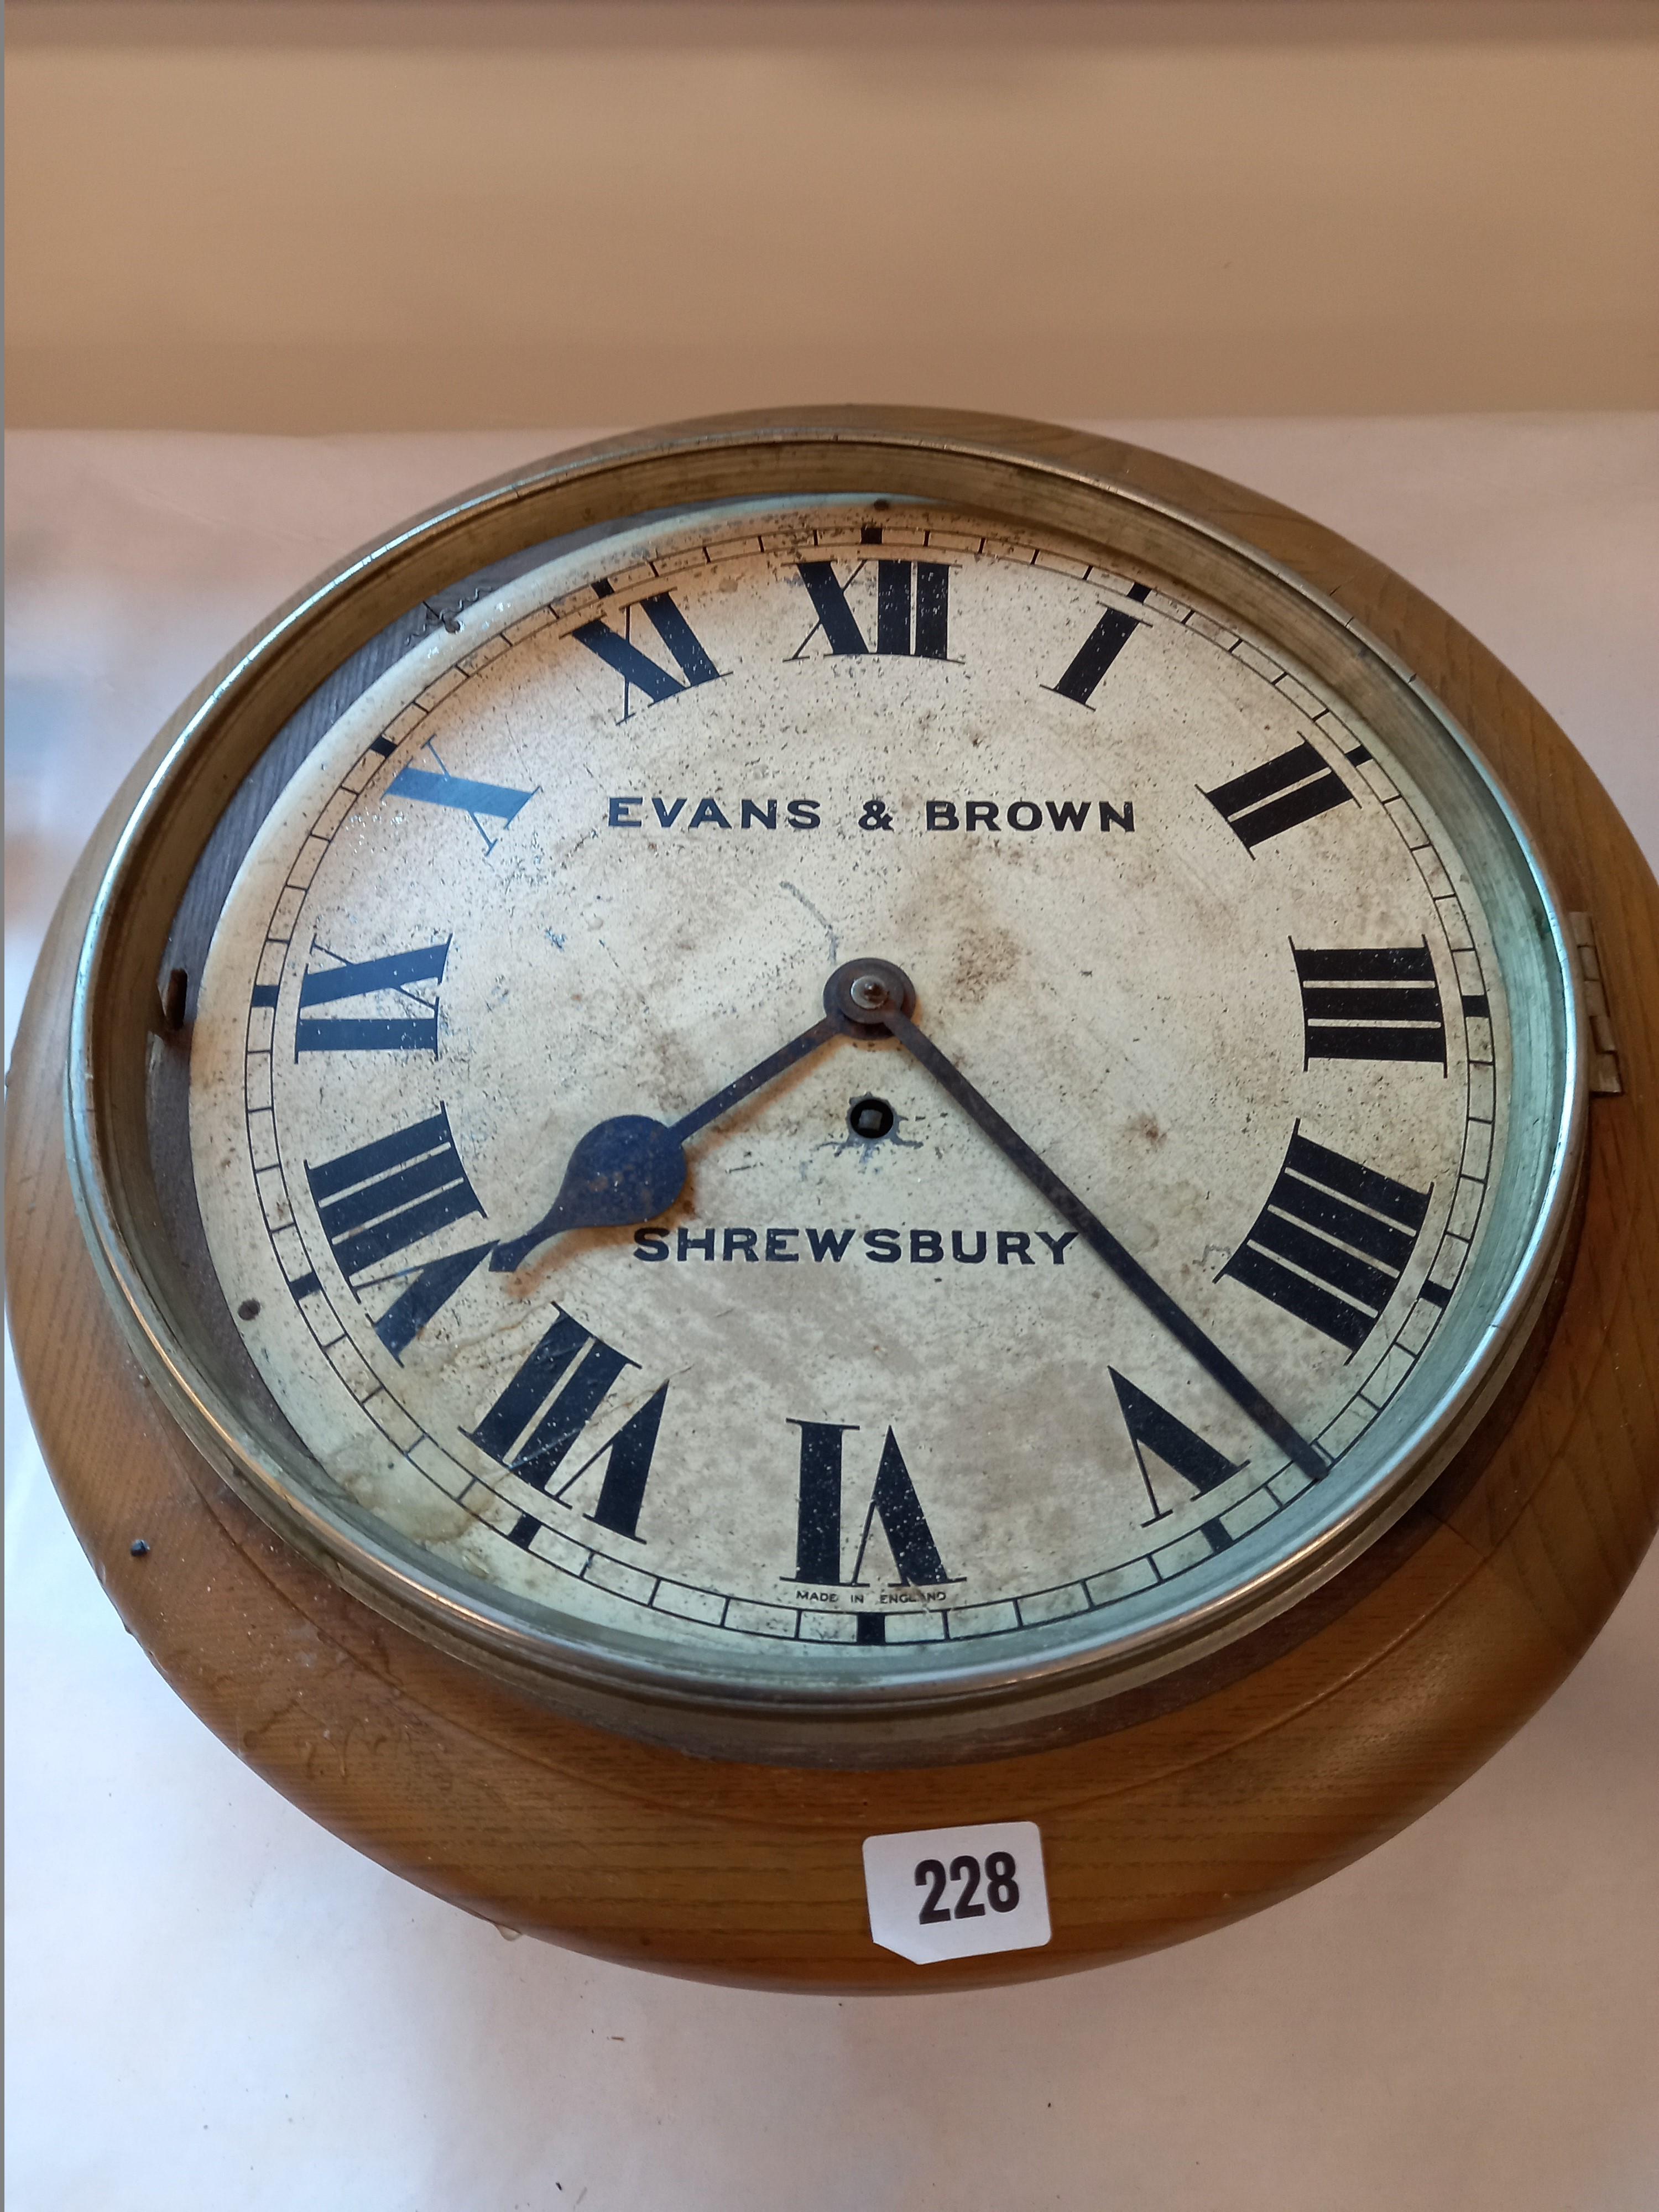 EVANS AND BROWN SHREWSBURY STATION CLOCK